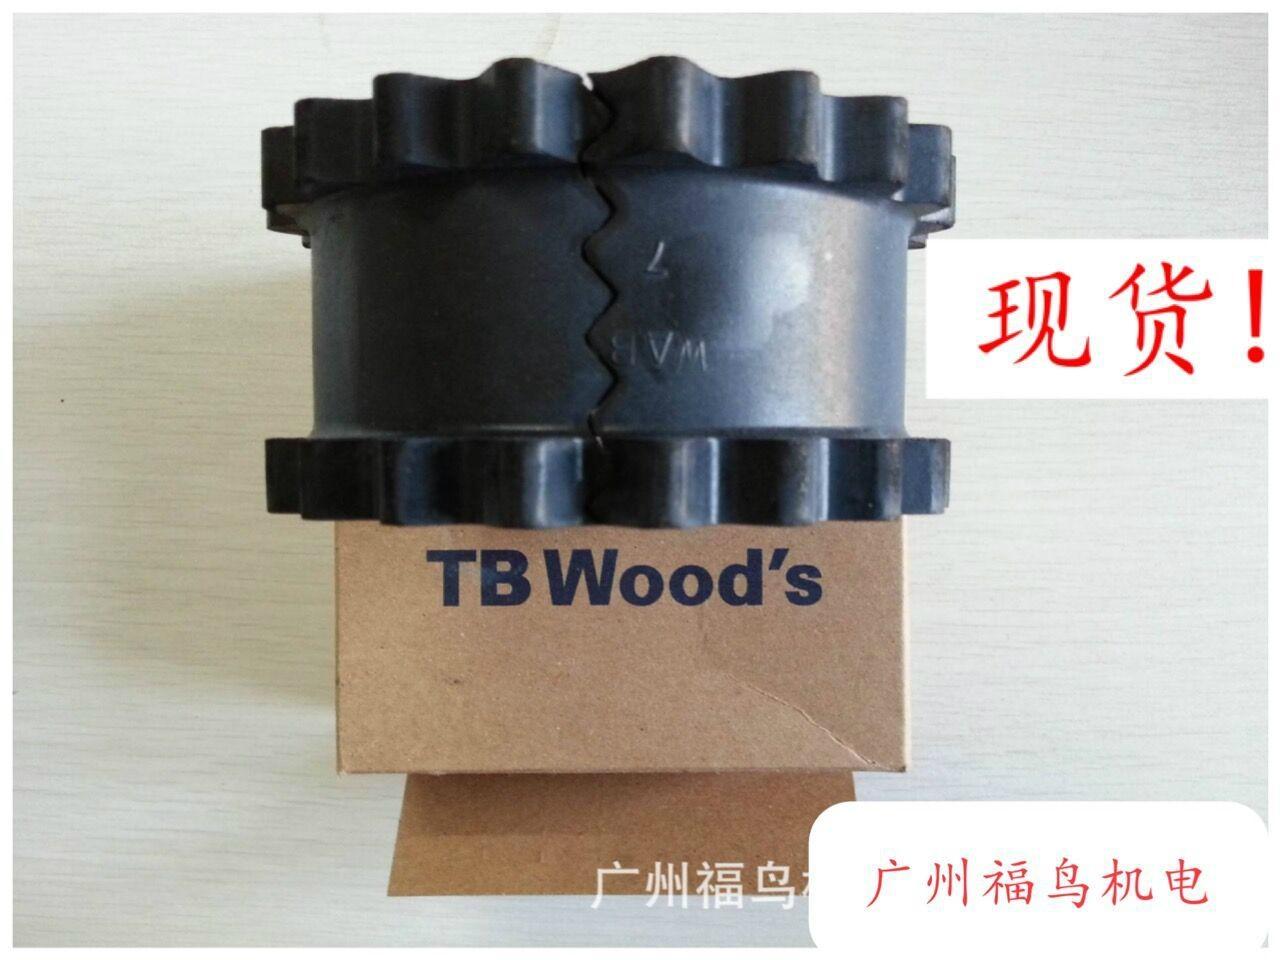 TB WOODS橡胶块, 型号: 6JES EPDM